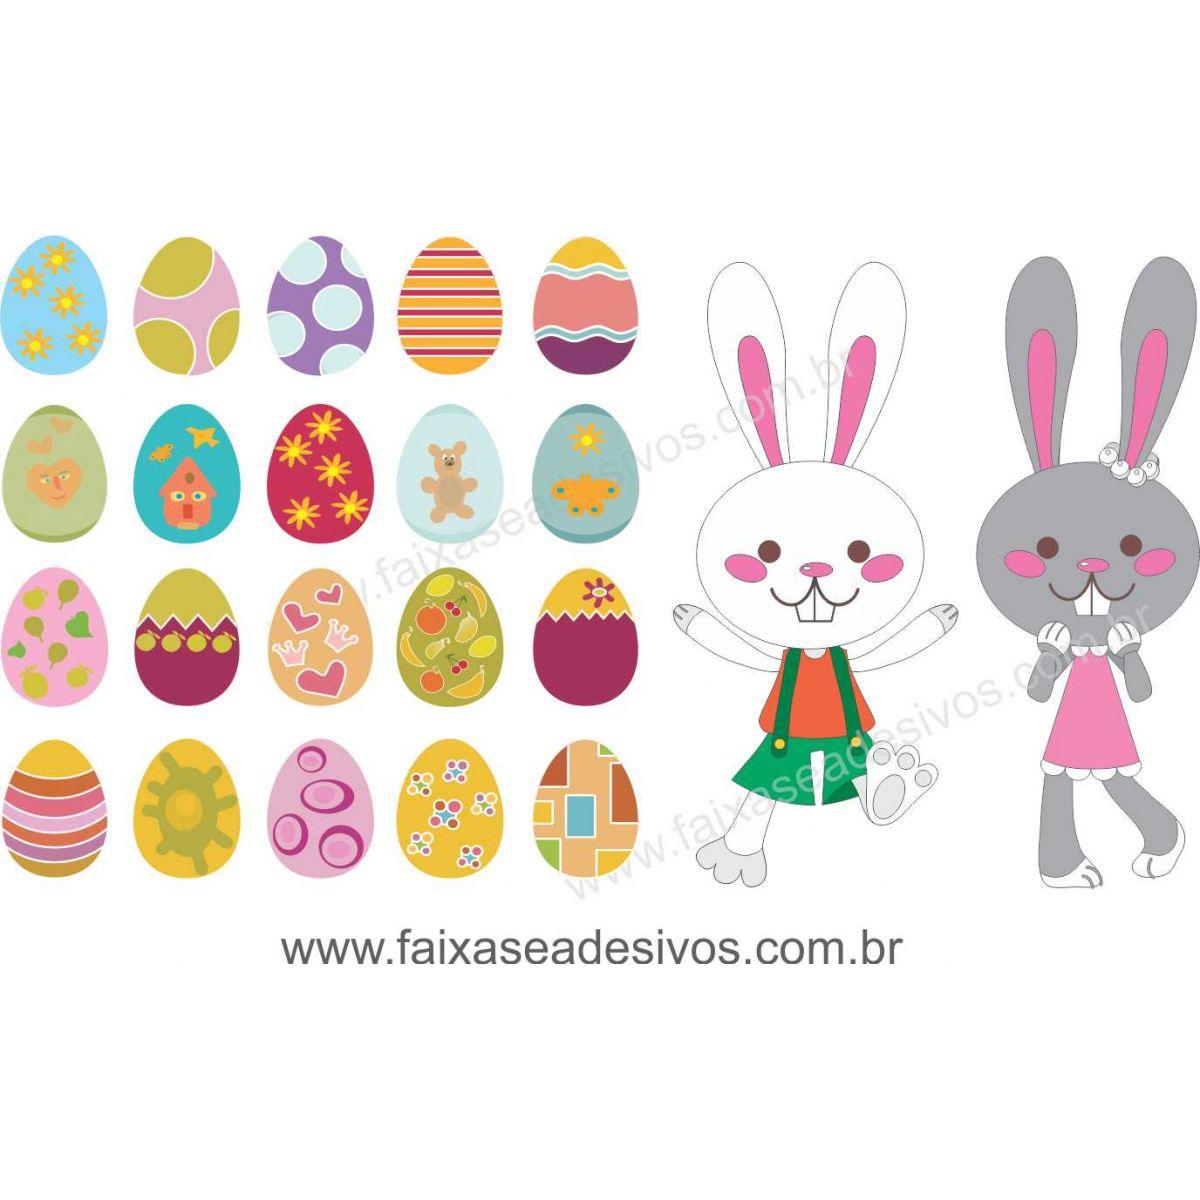 Adesivo Rivastigmina Bula ~ AP412 Adesivo Decorativo de Páscoa Cartela Kids FAC Signs Impress u00e3o Digital